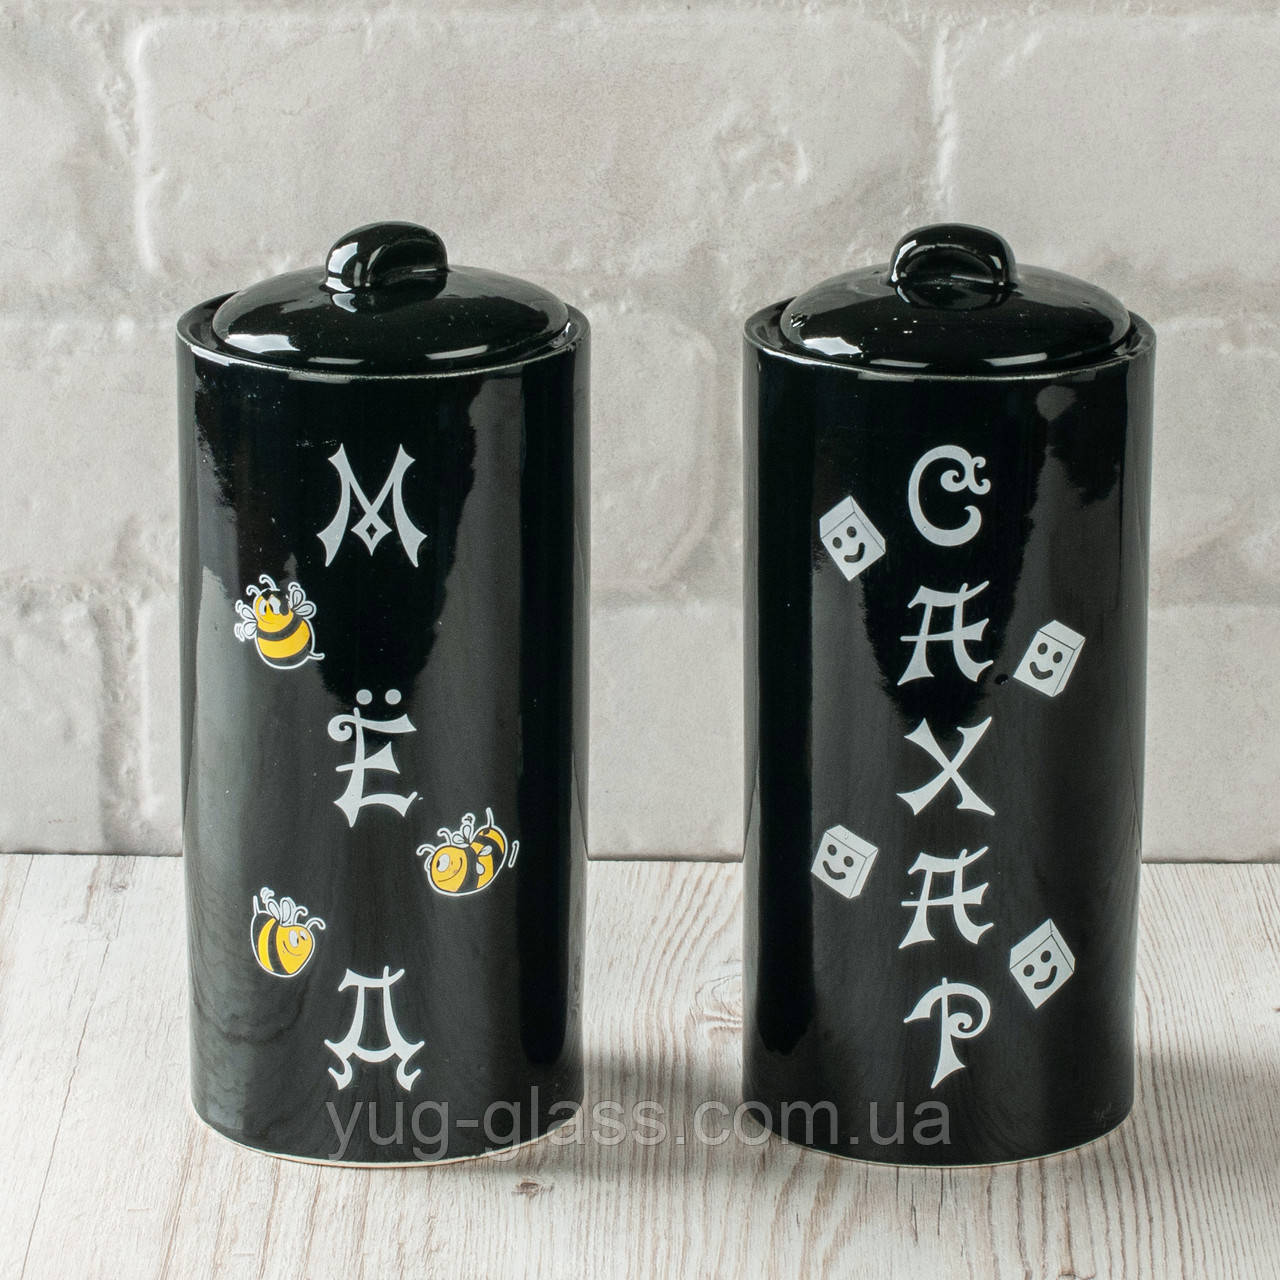 Набор   керамический 2-х предметный  ( Мёд+Сахар) чёрн.глянец